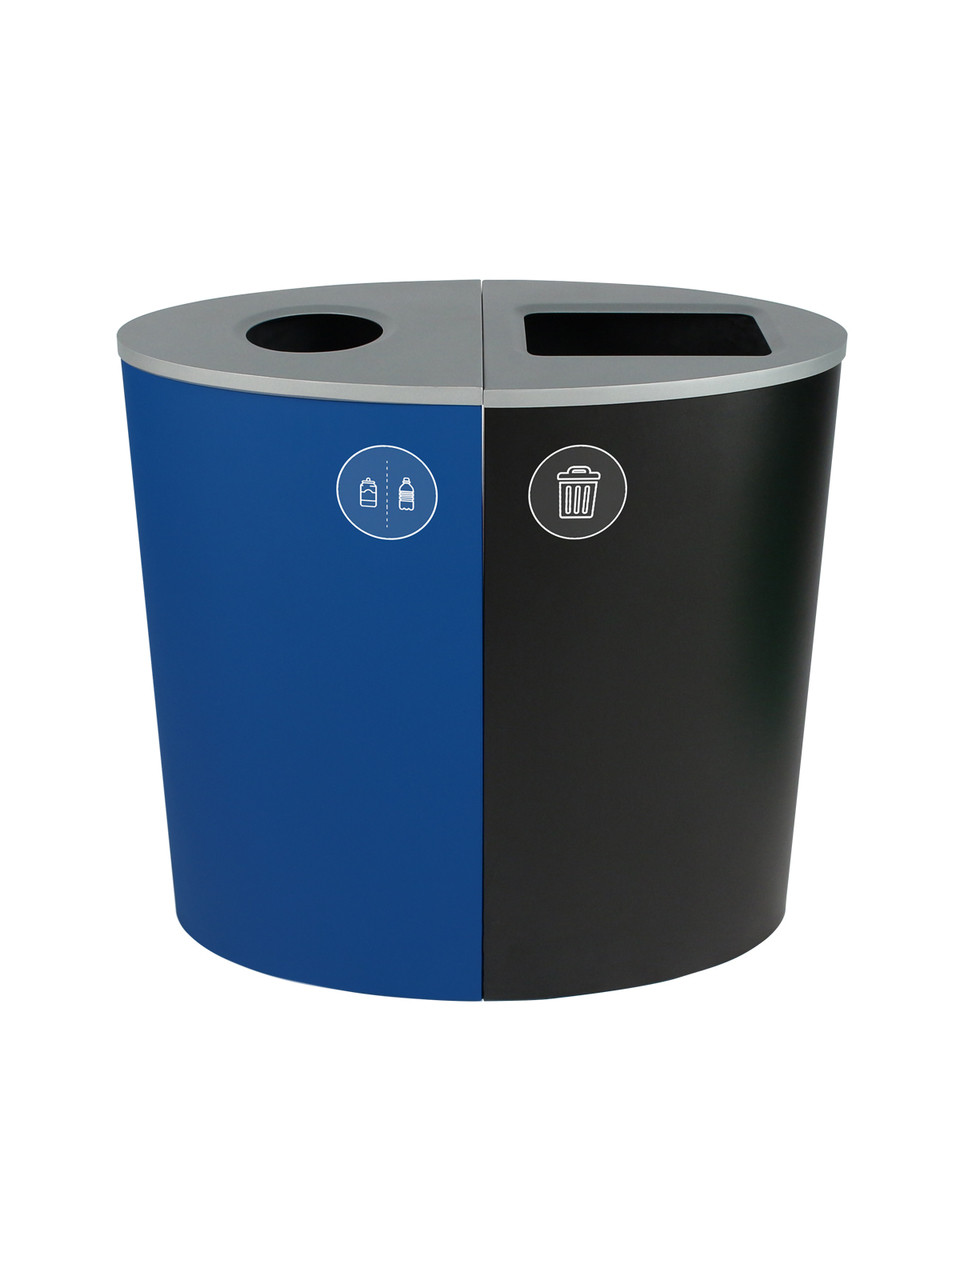 44 Gallon Spectrum Ellipse Dual Trash Can & Recycle Bin Blue/Black 8107074-14